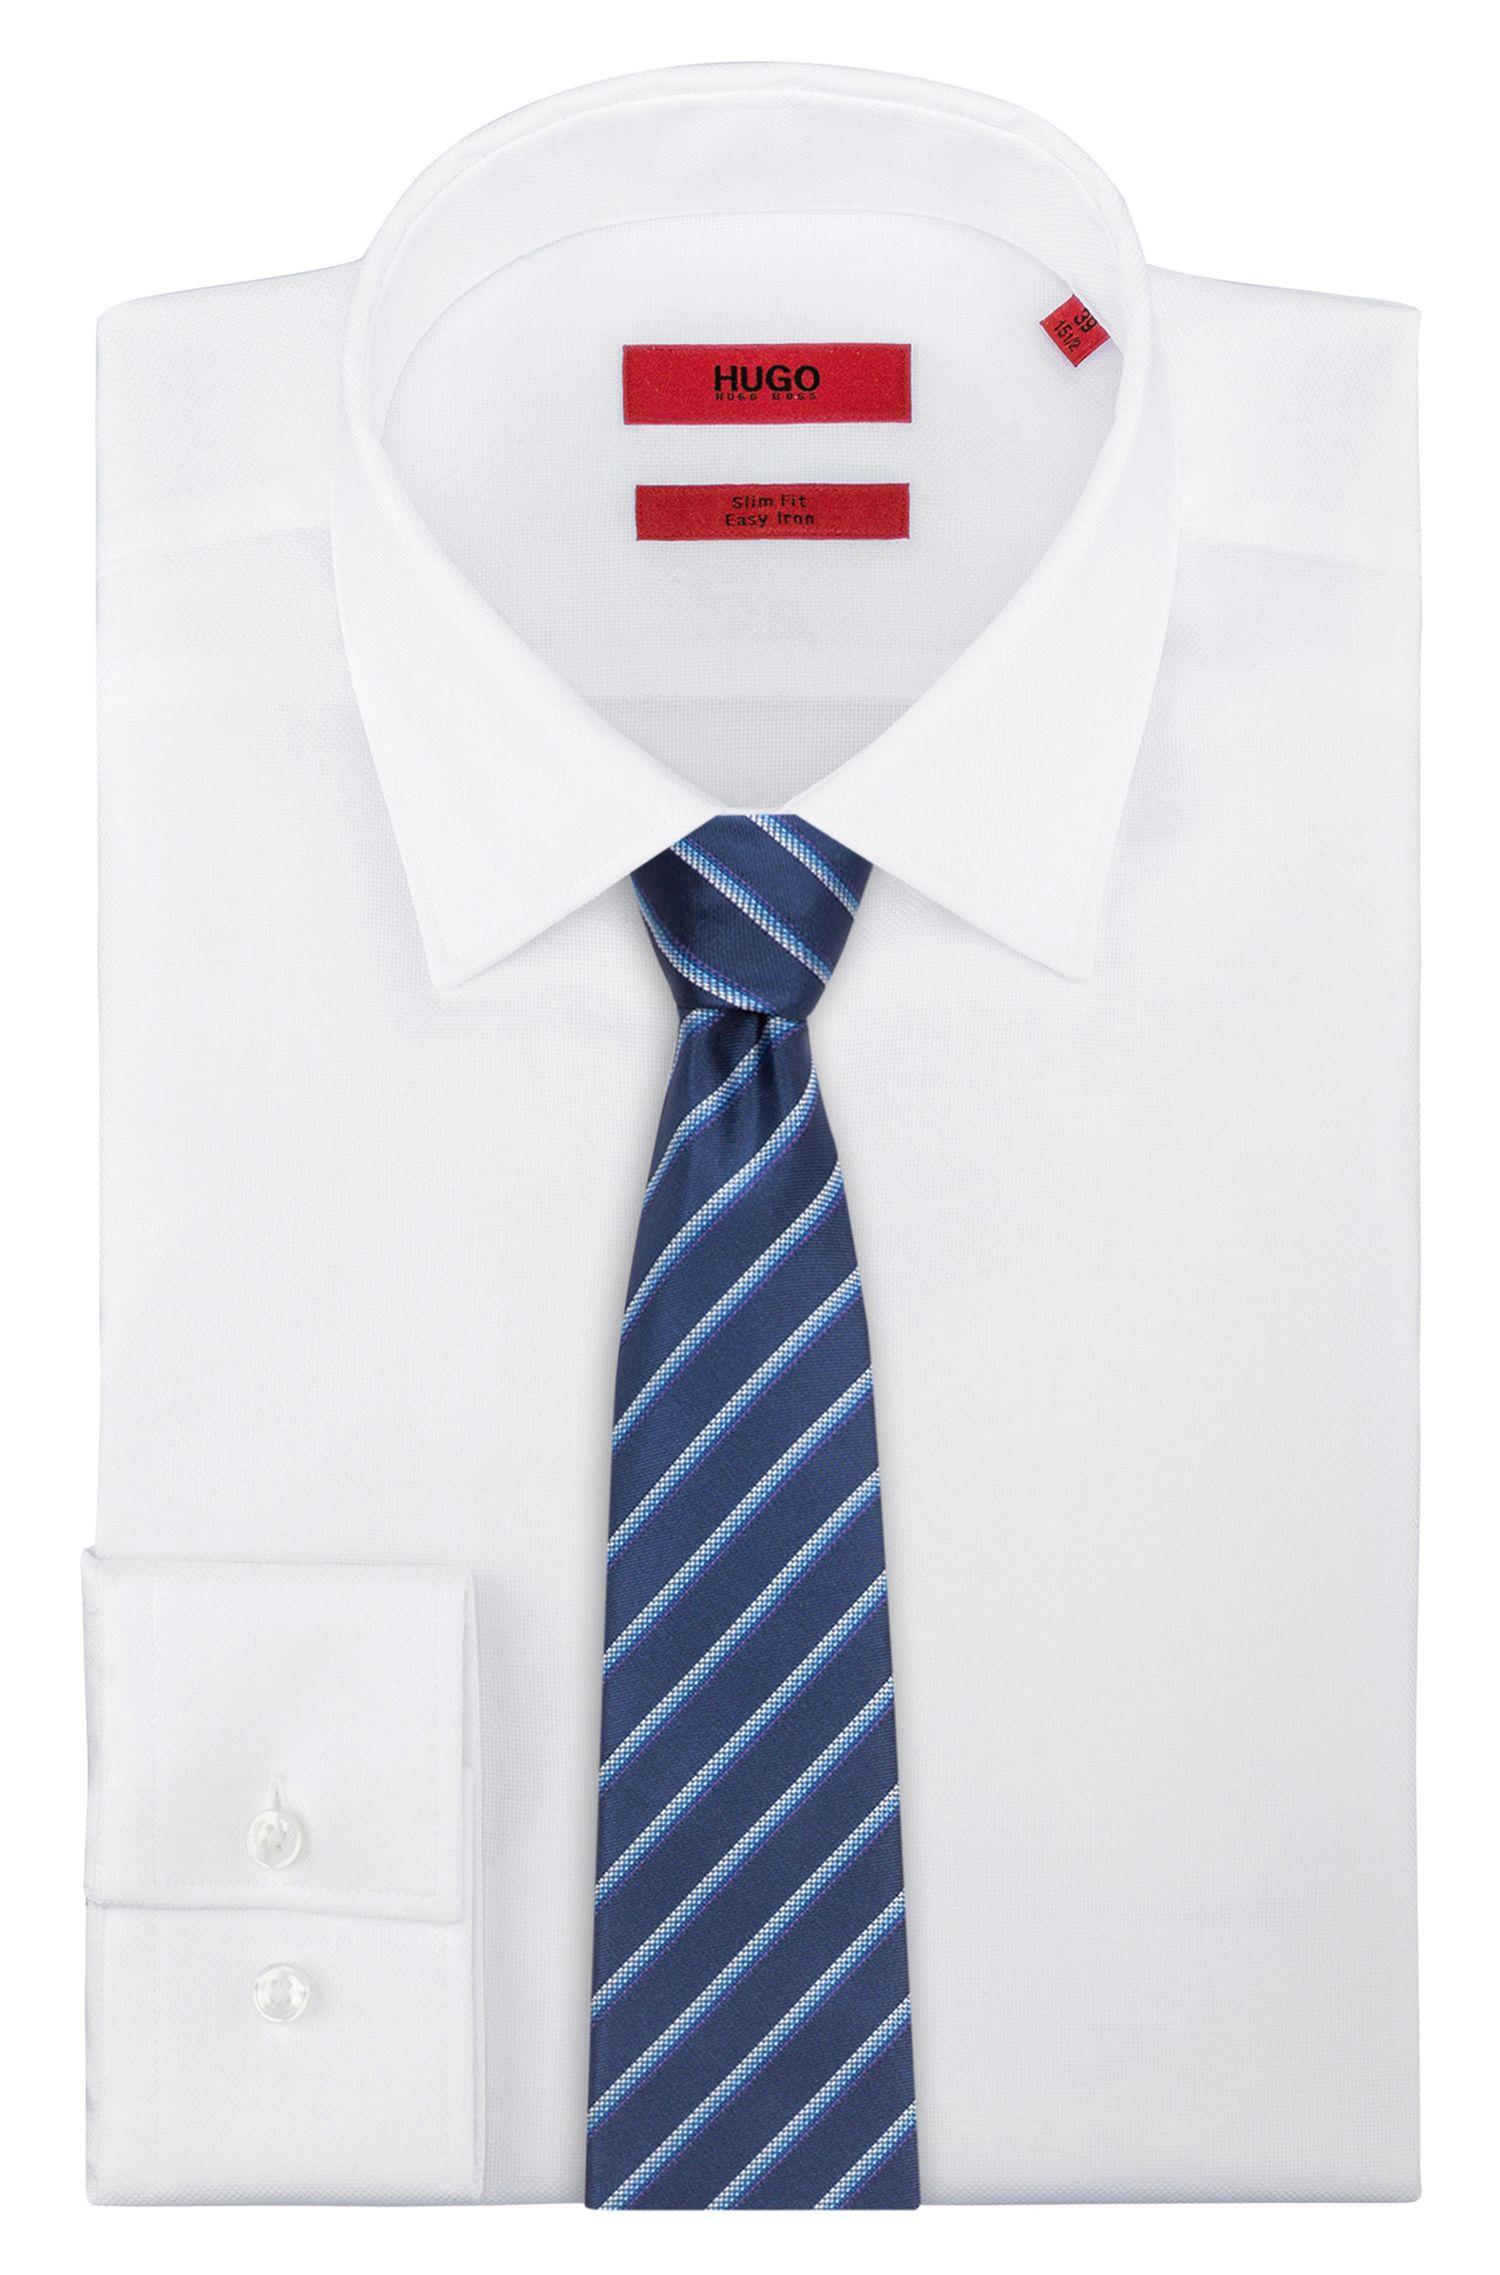 Corbata de seda con rayas en diagonal